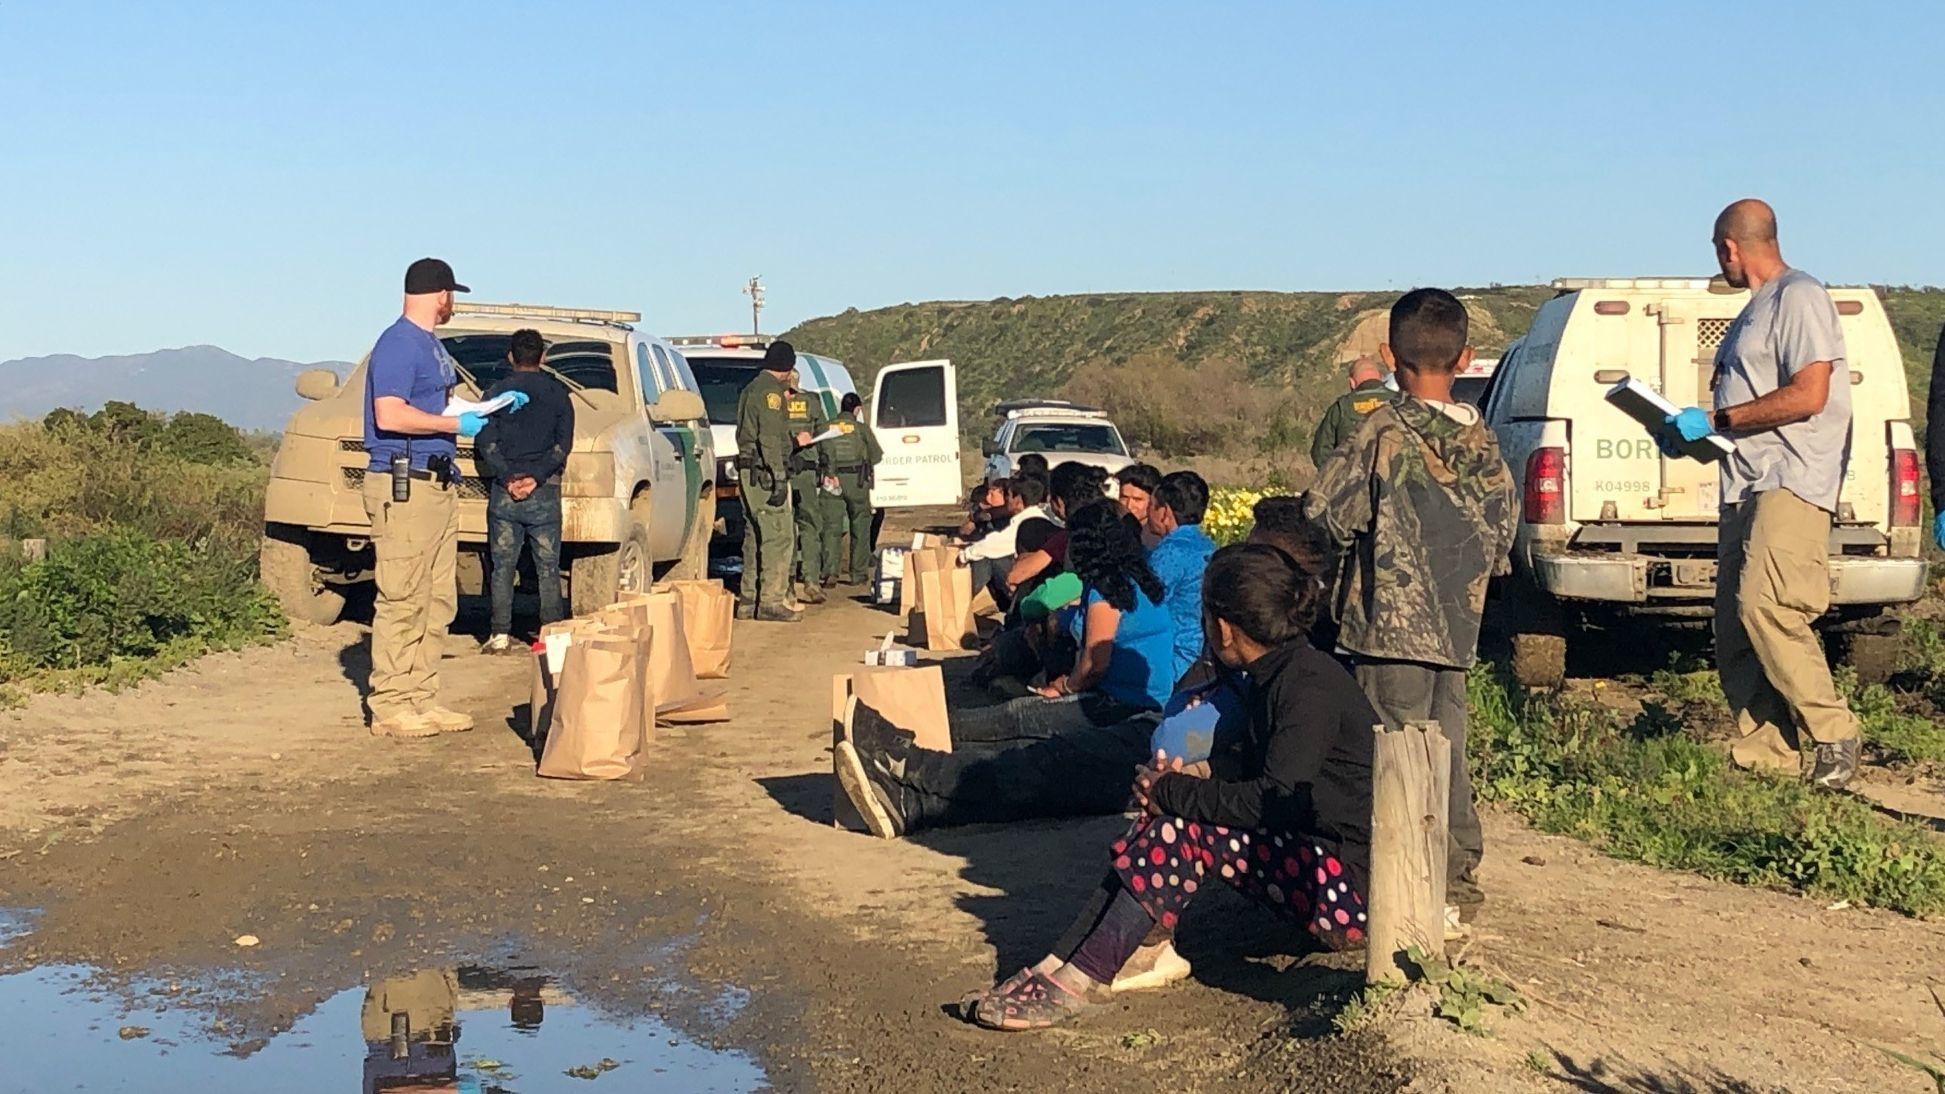 Dozens of migrants breach border fence at Pacific Ocean